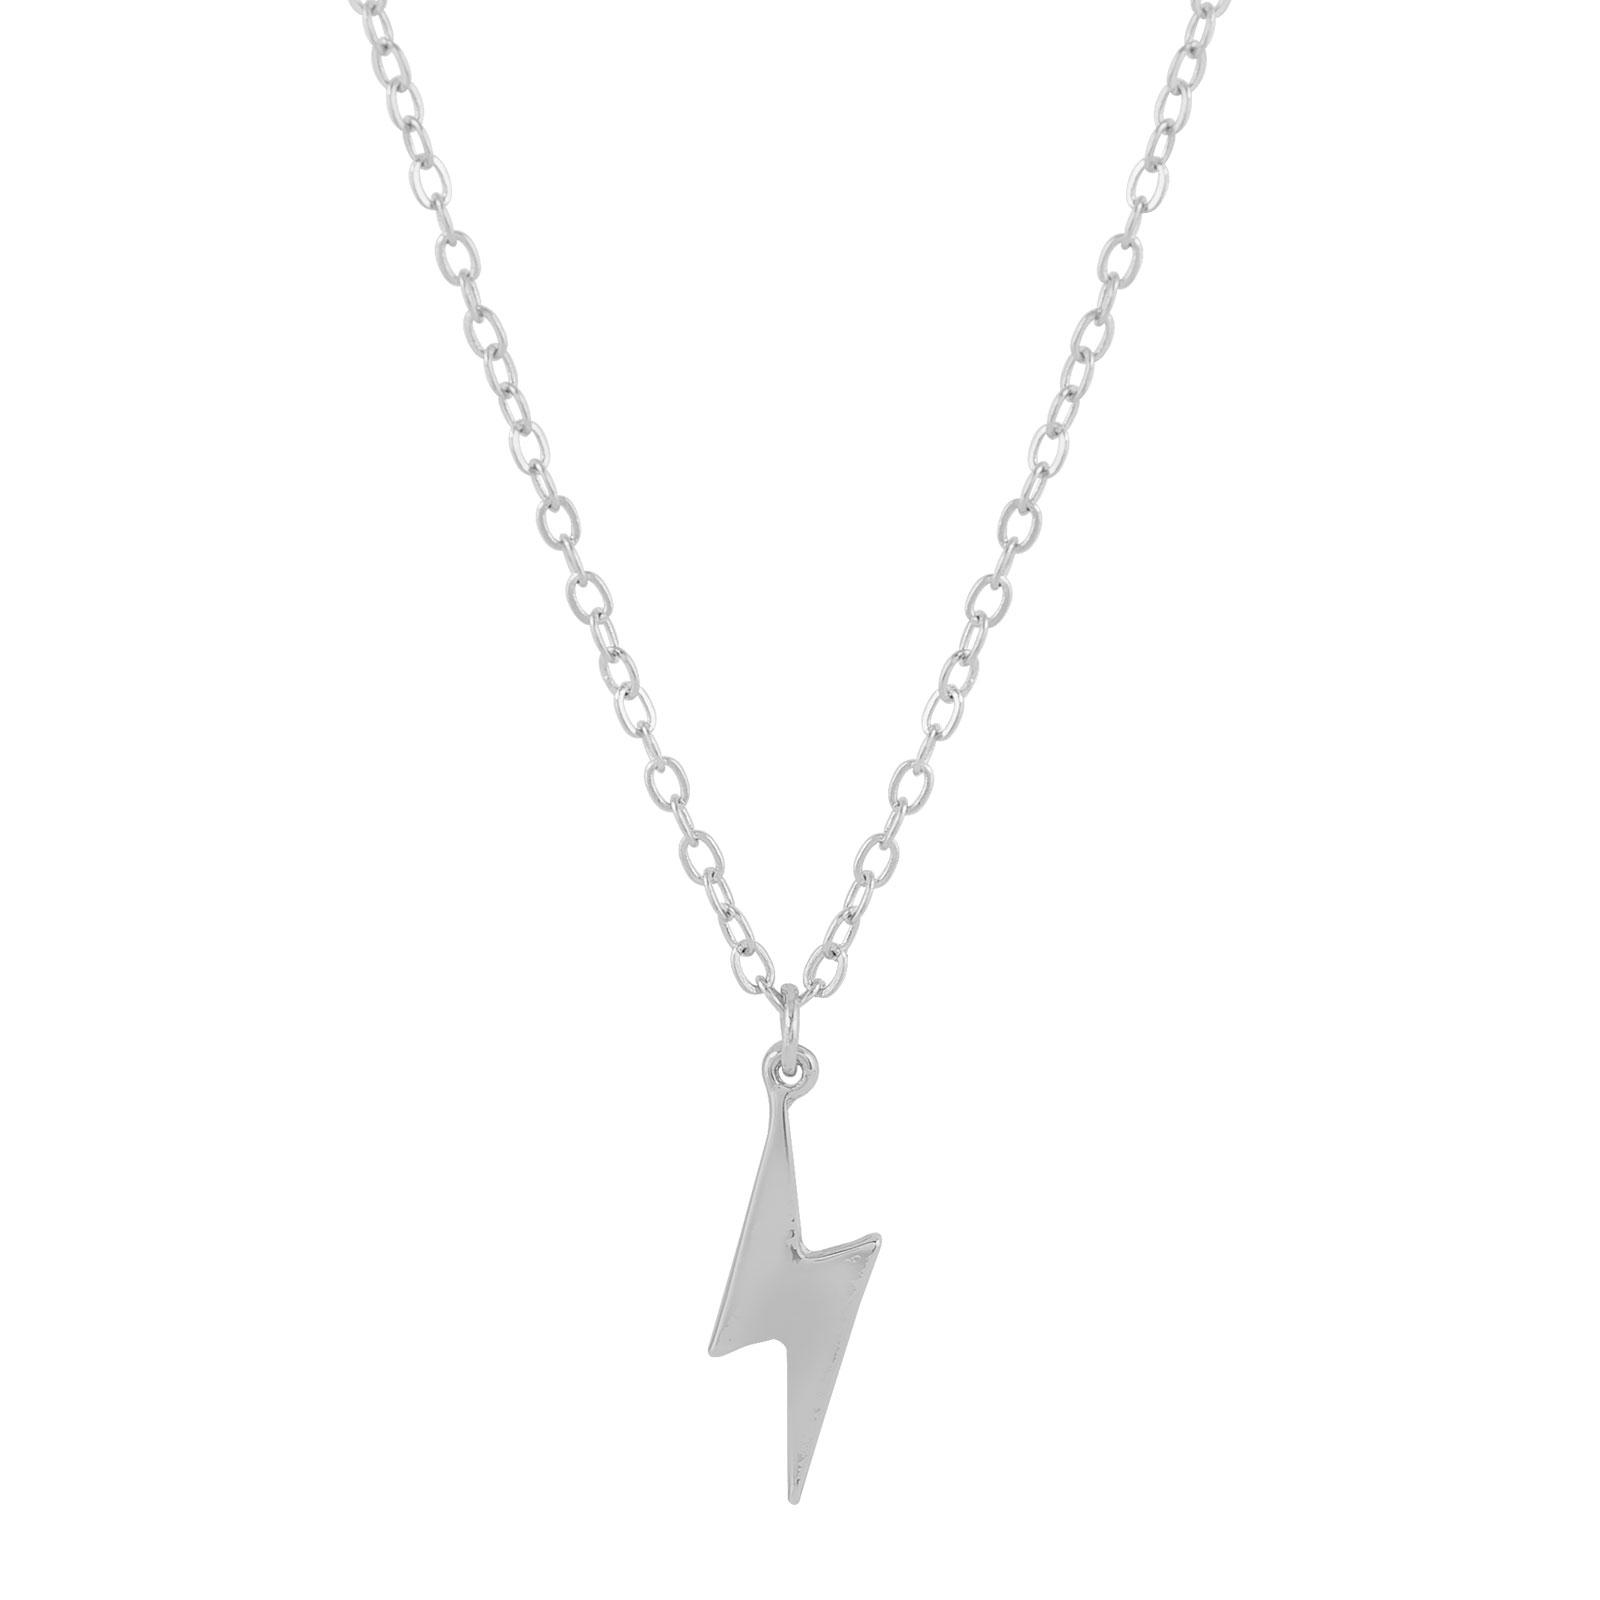 Halsband med blixt silver Montini